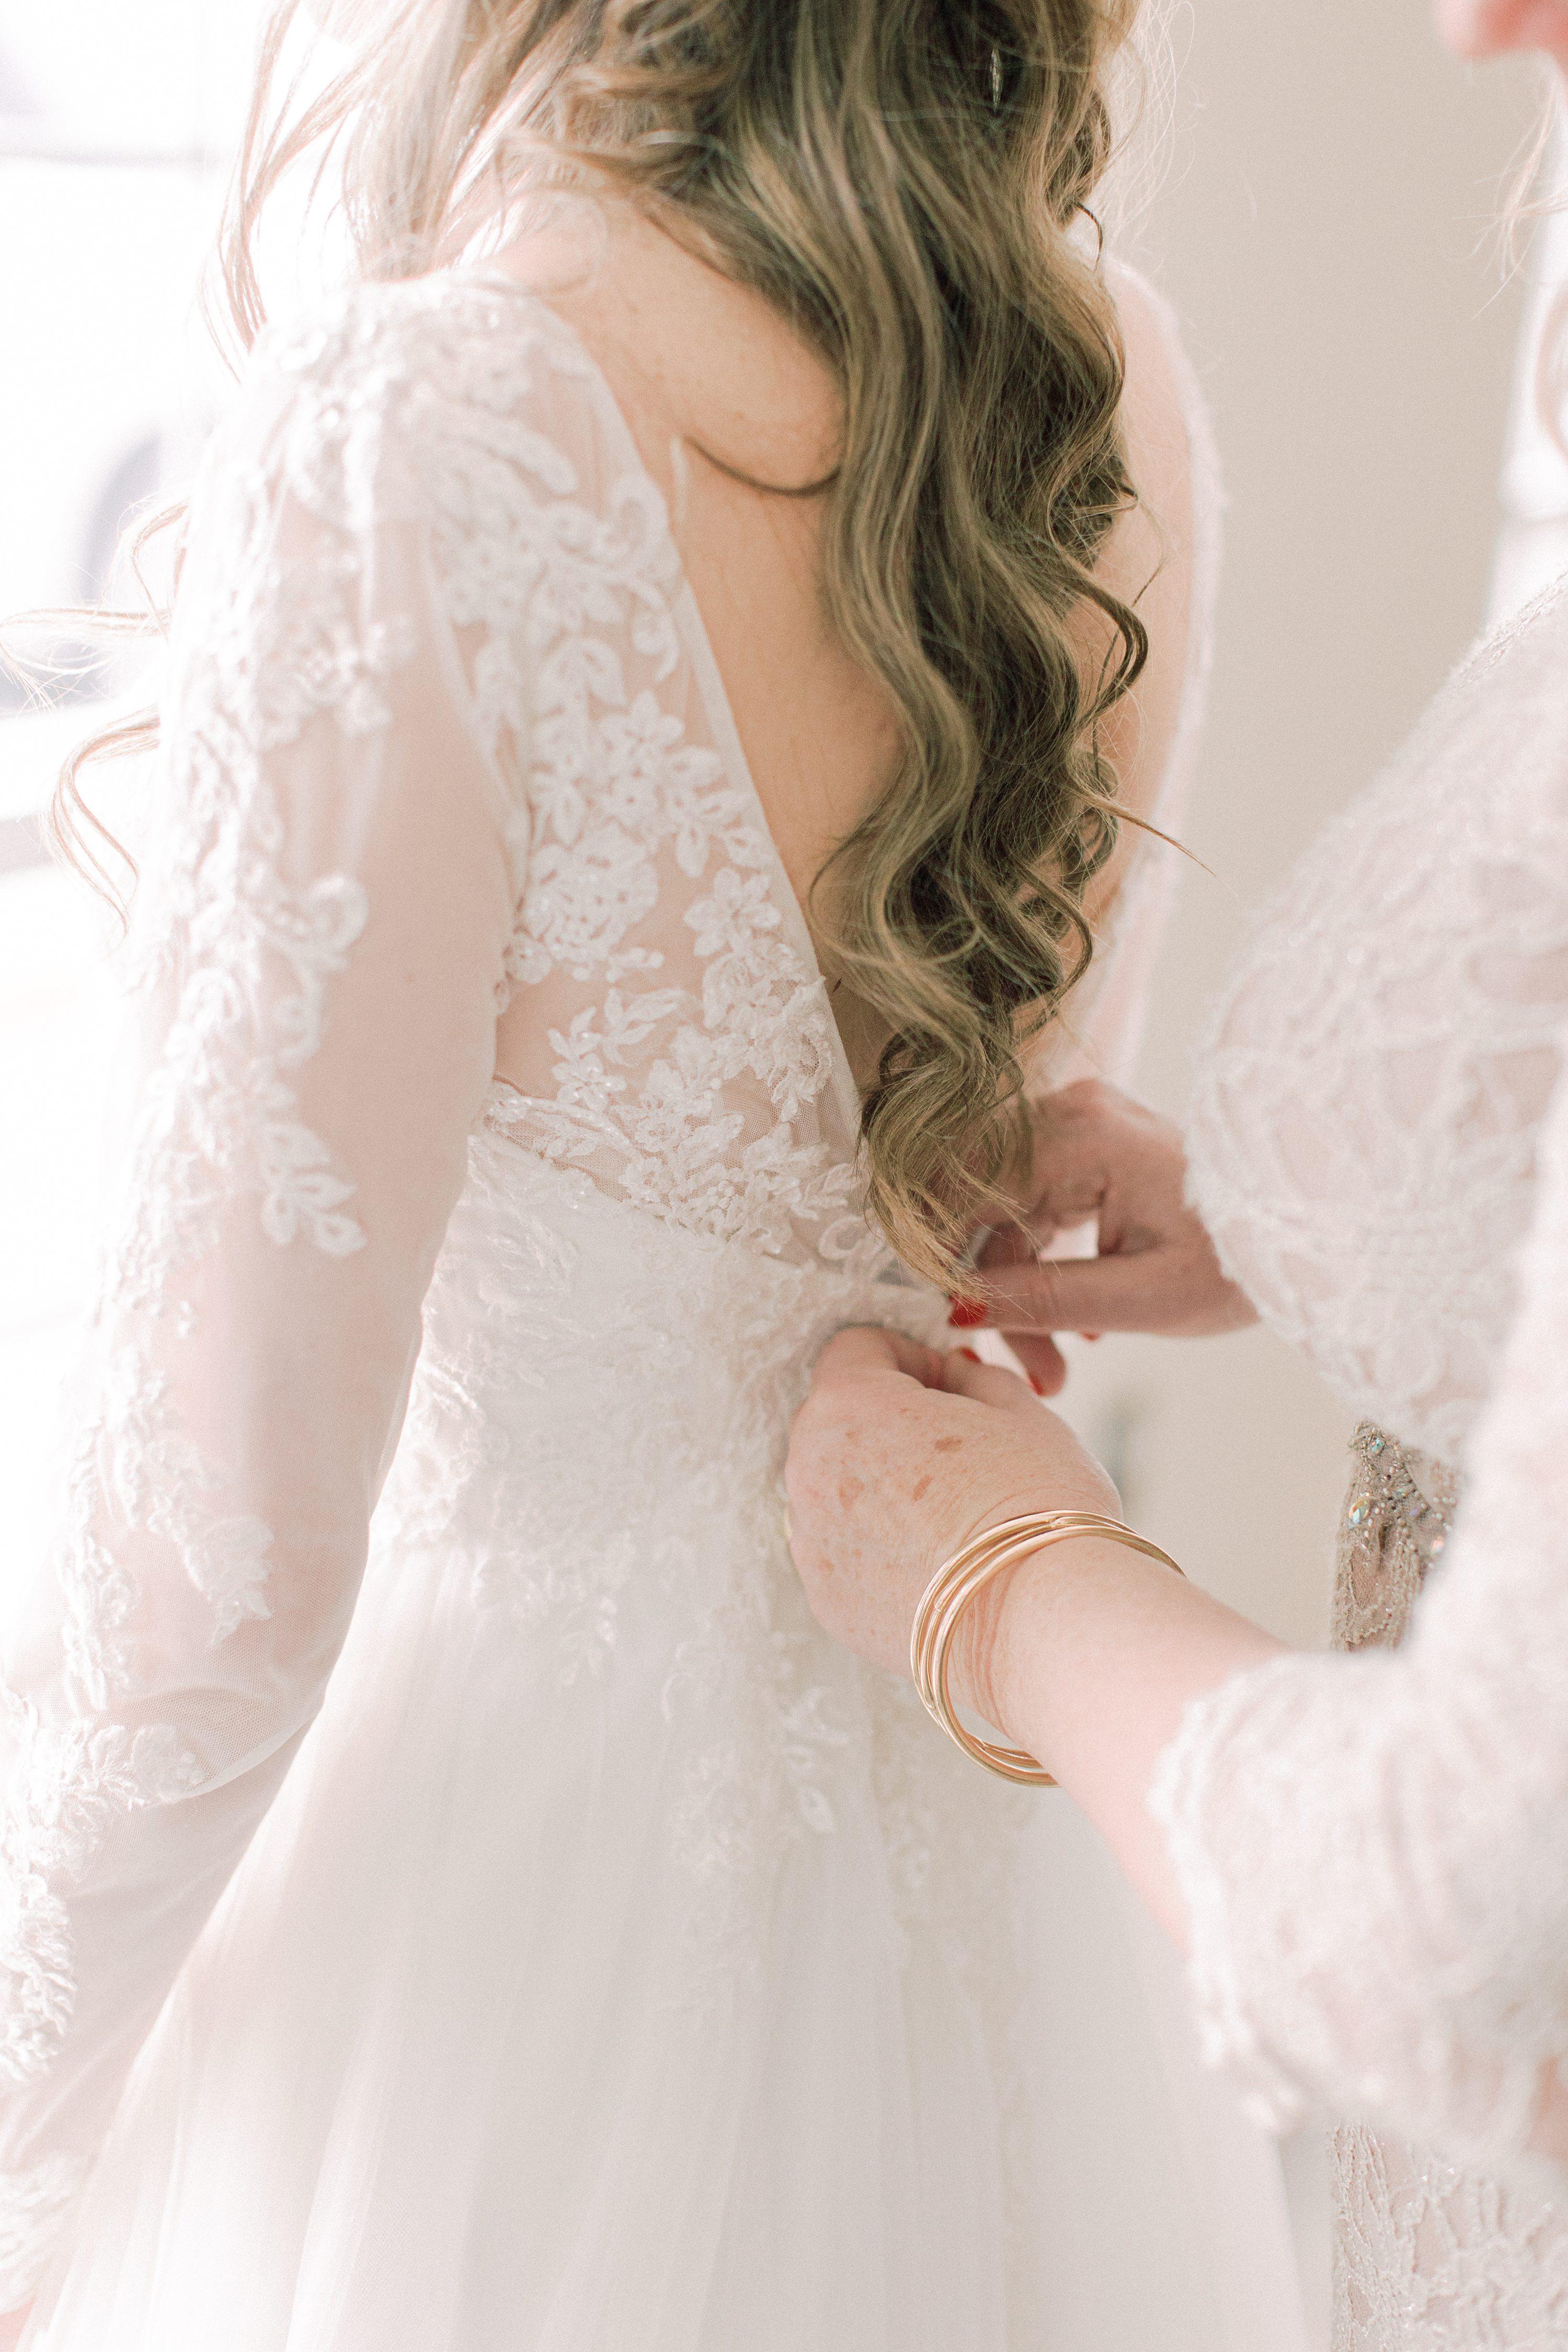 Winter bride,Winter wedding,Iowa Winter Wedding,Iowa wedding,Ames Wedding